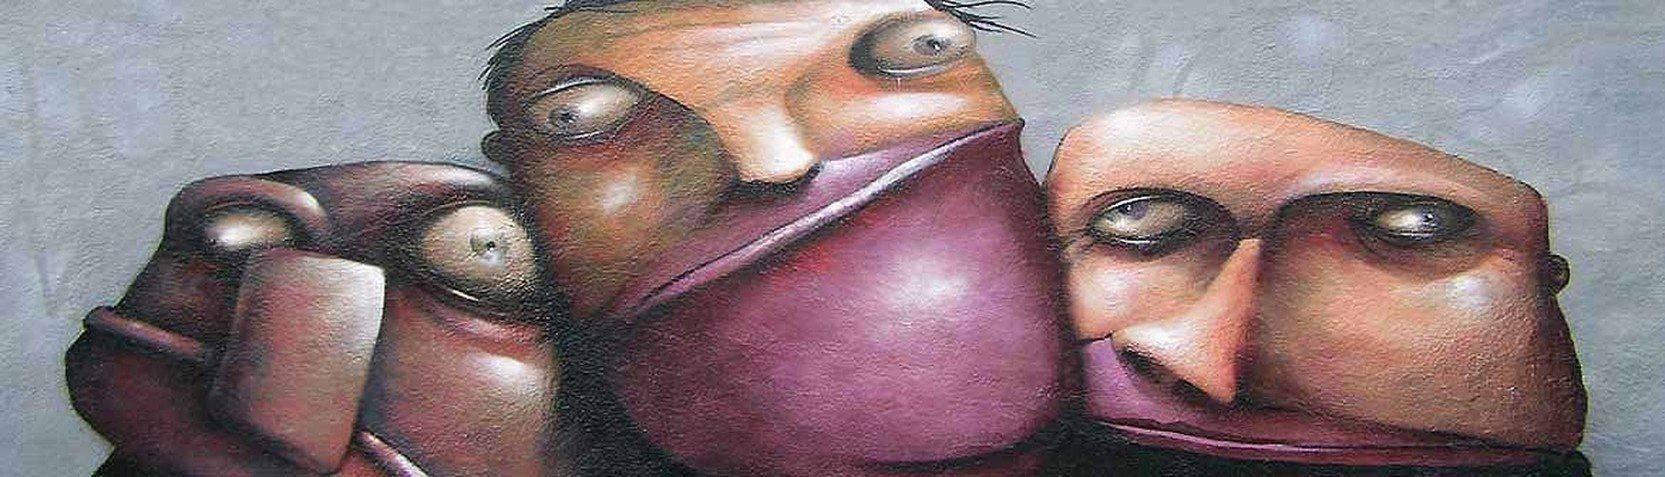 Styles - Graffiti & streetart